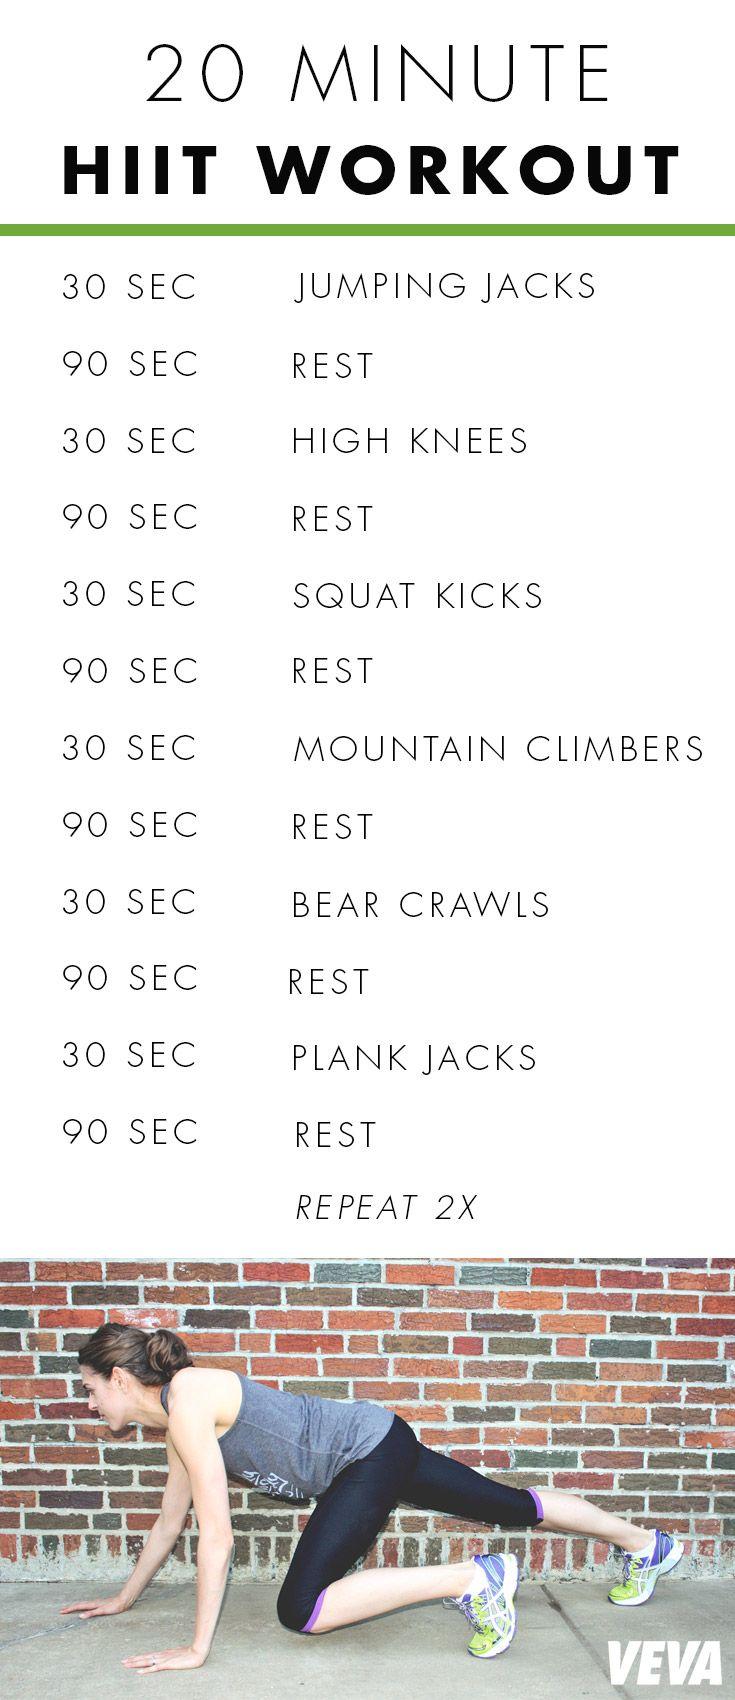 20 Minute HIIT Workout | Veva